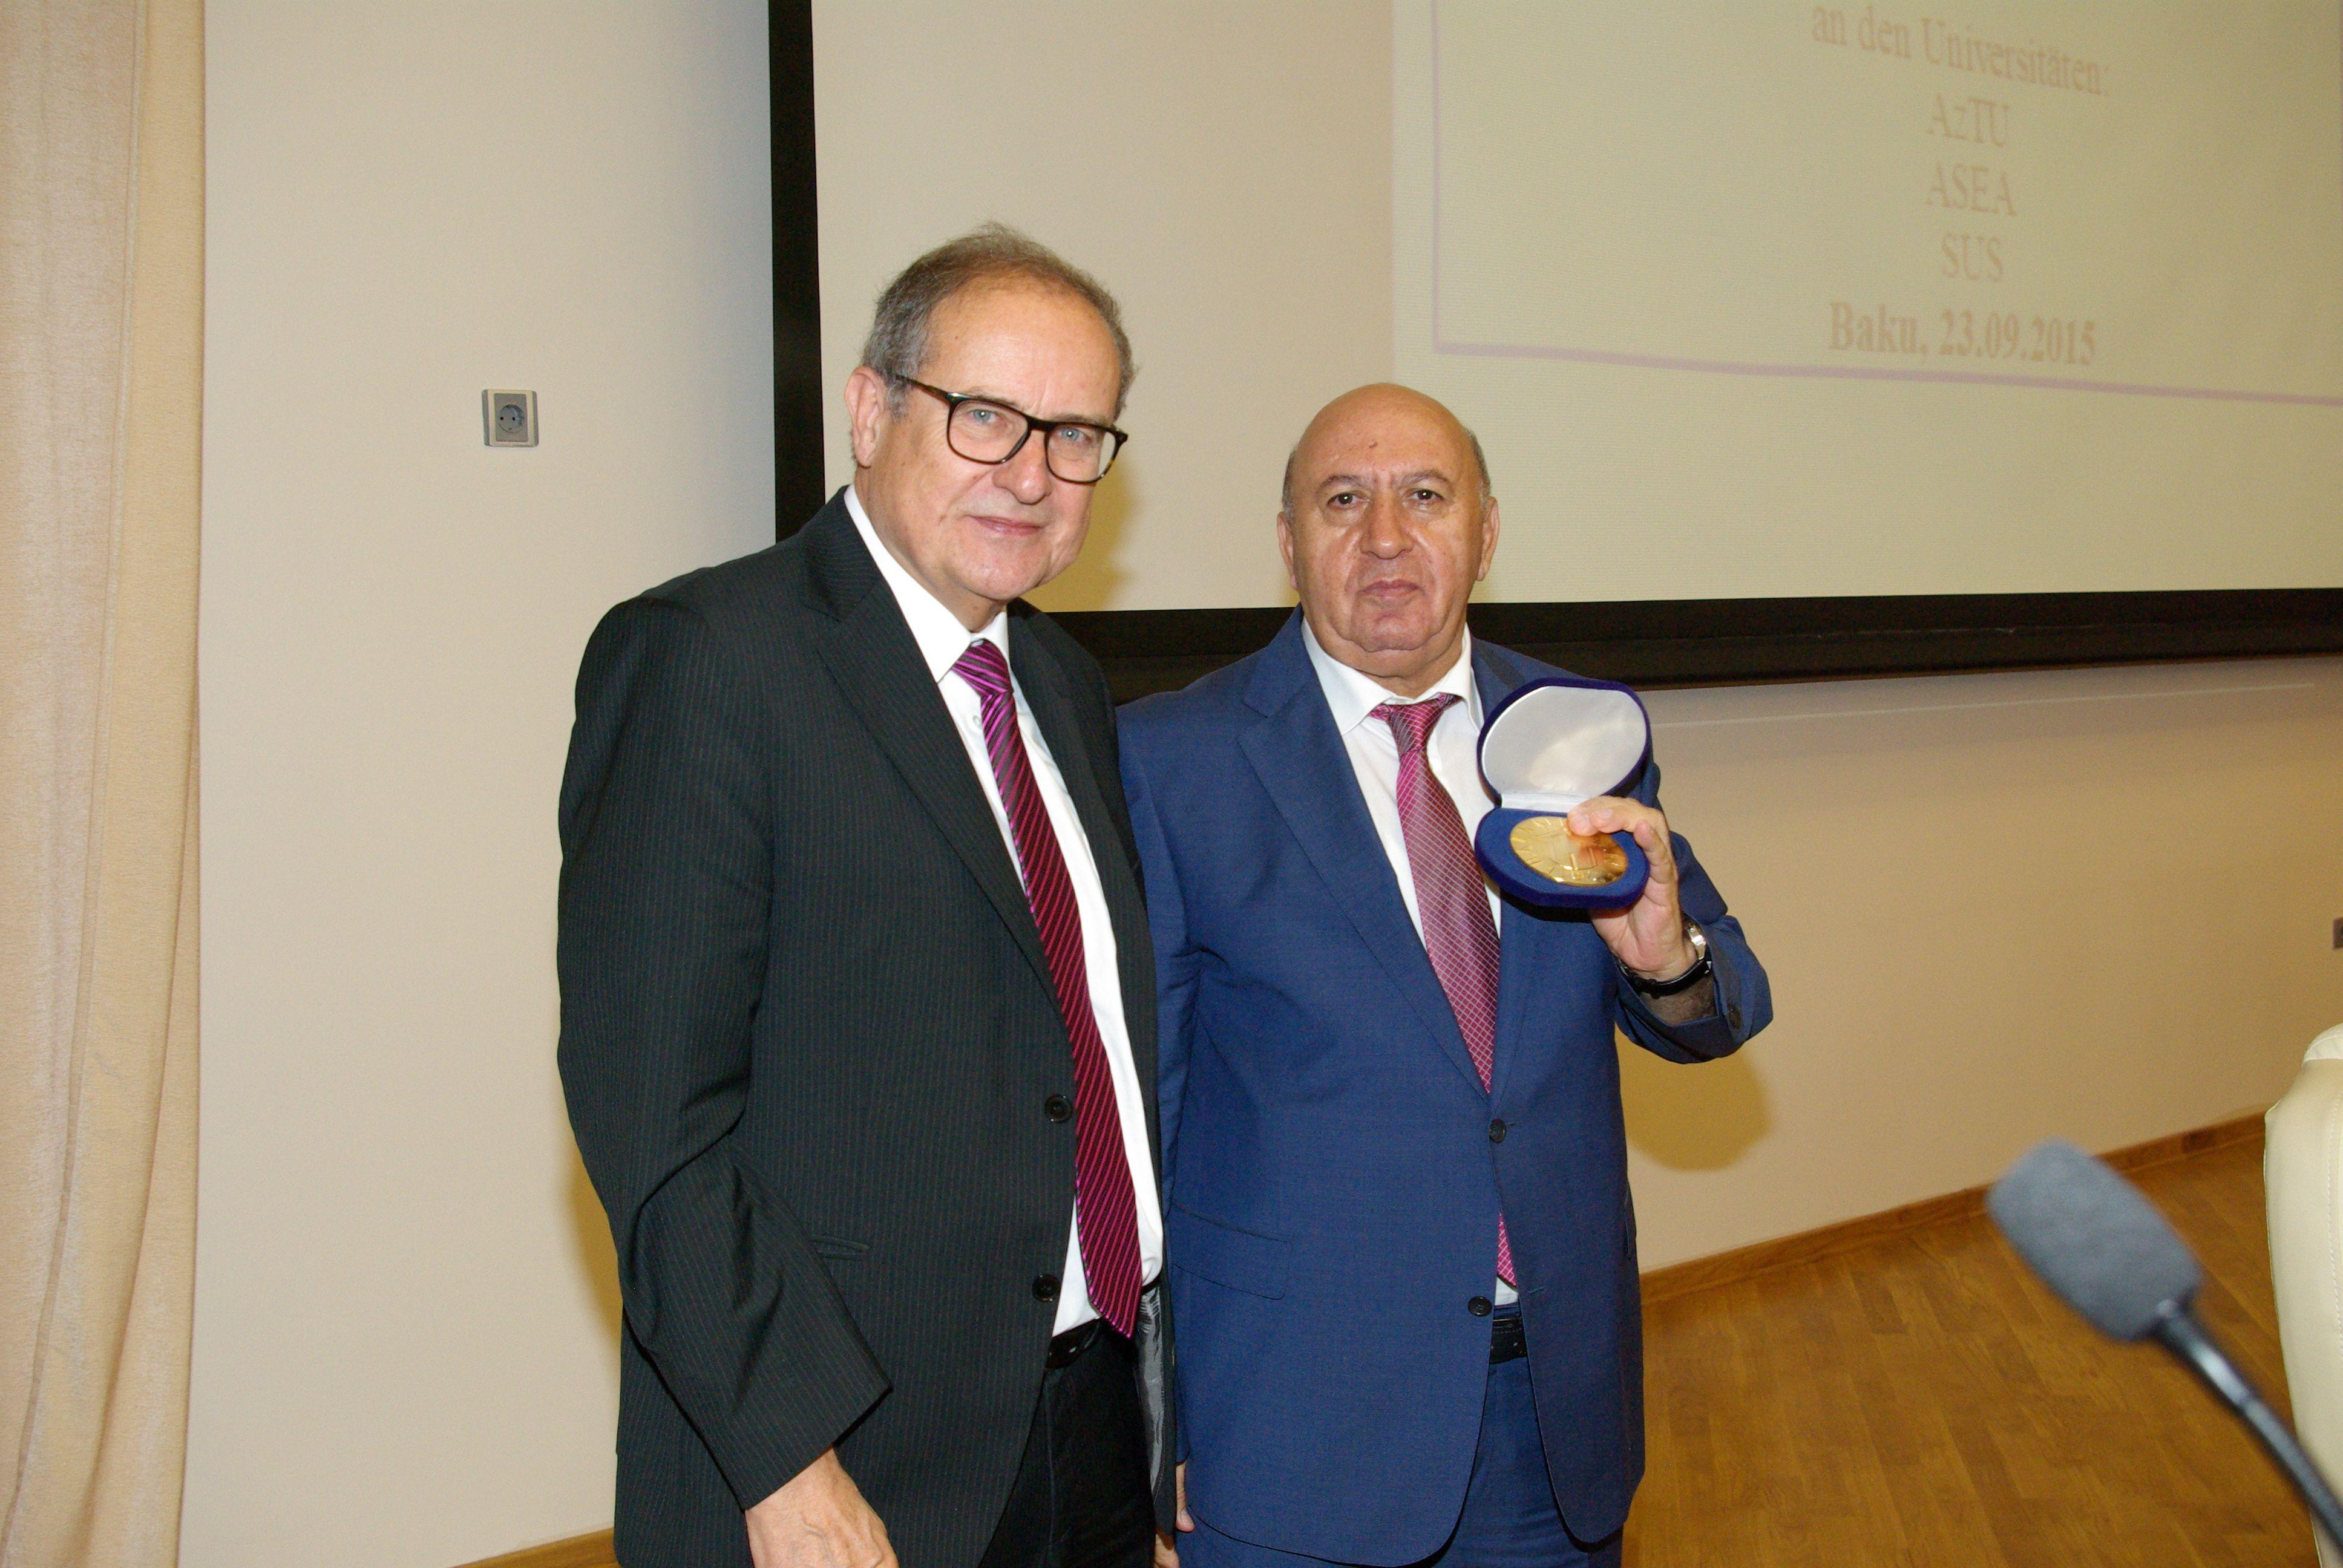 "23 September 2015, 516678 TEMPUS-1-2011-1-DE-TEMPUS-JPCR . Tempus project final conference on ""Energy management"" at Azerbaijan Technical University, in Baku , Azerbaijan."